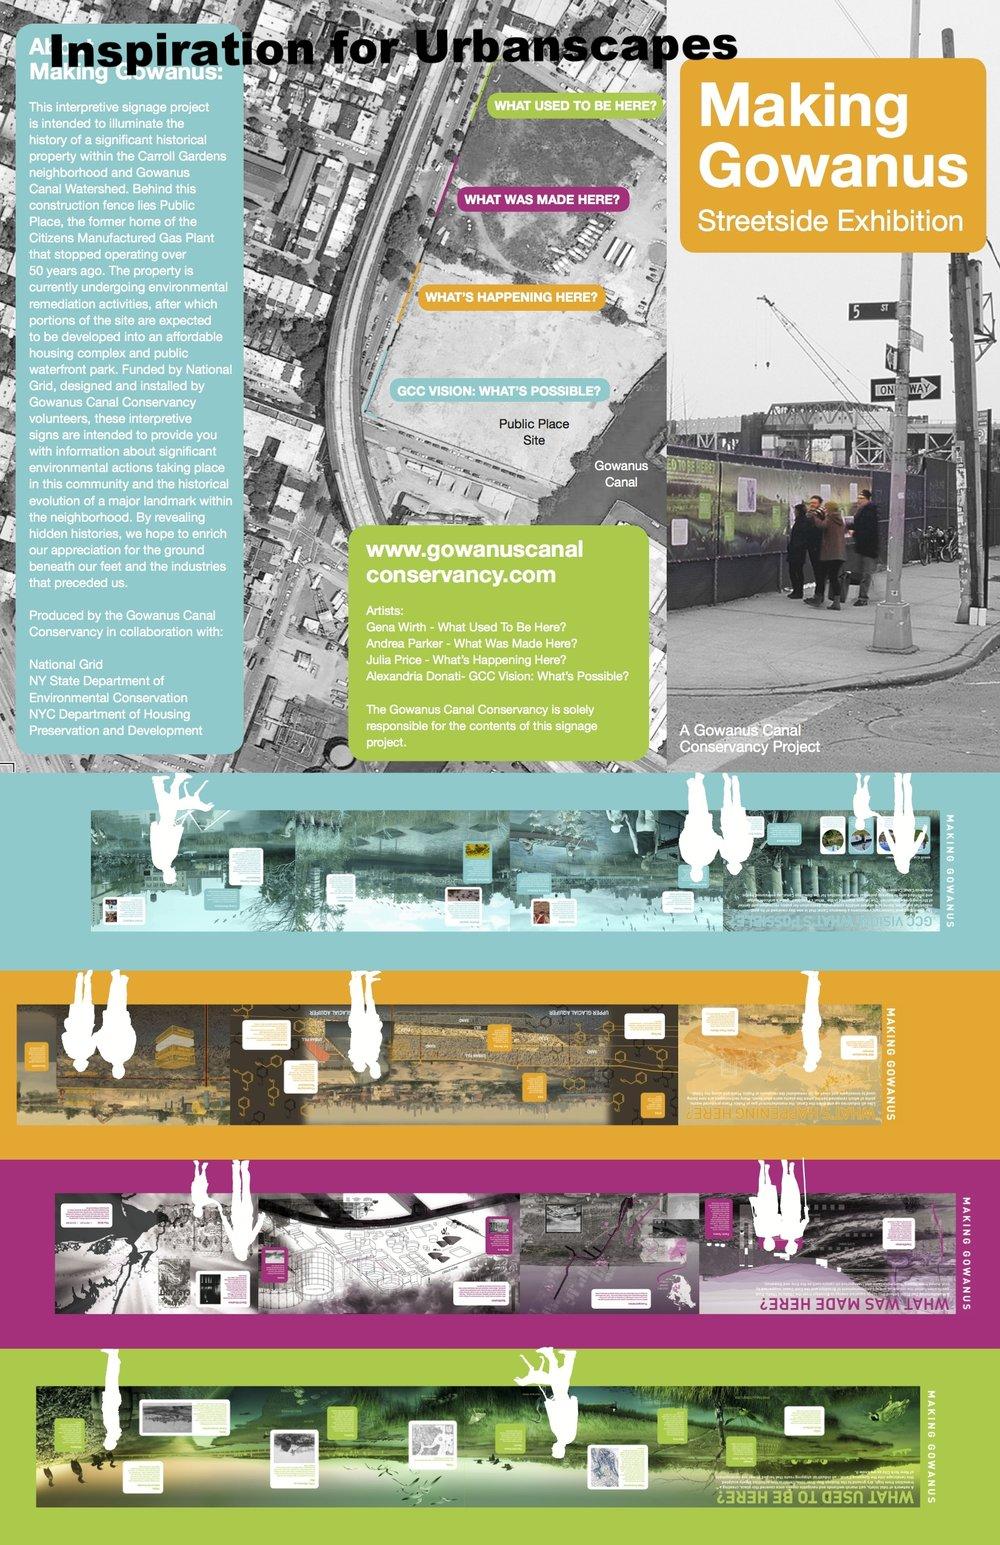 Making Gowanus by, Andrea Parker, Gina Wirth, Julia Price, & Alexandra Donati